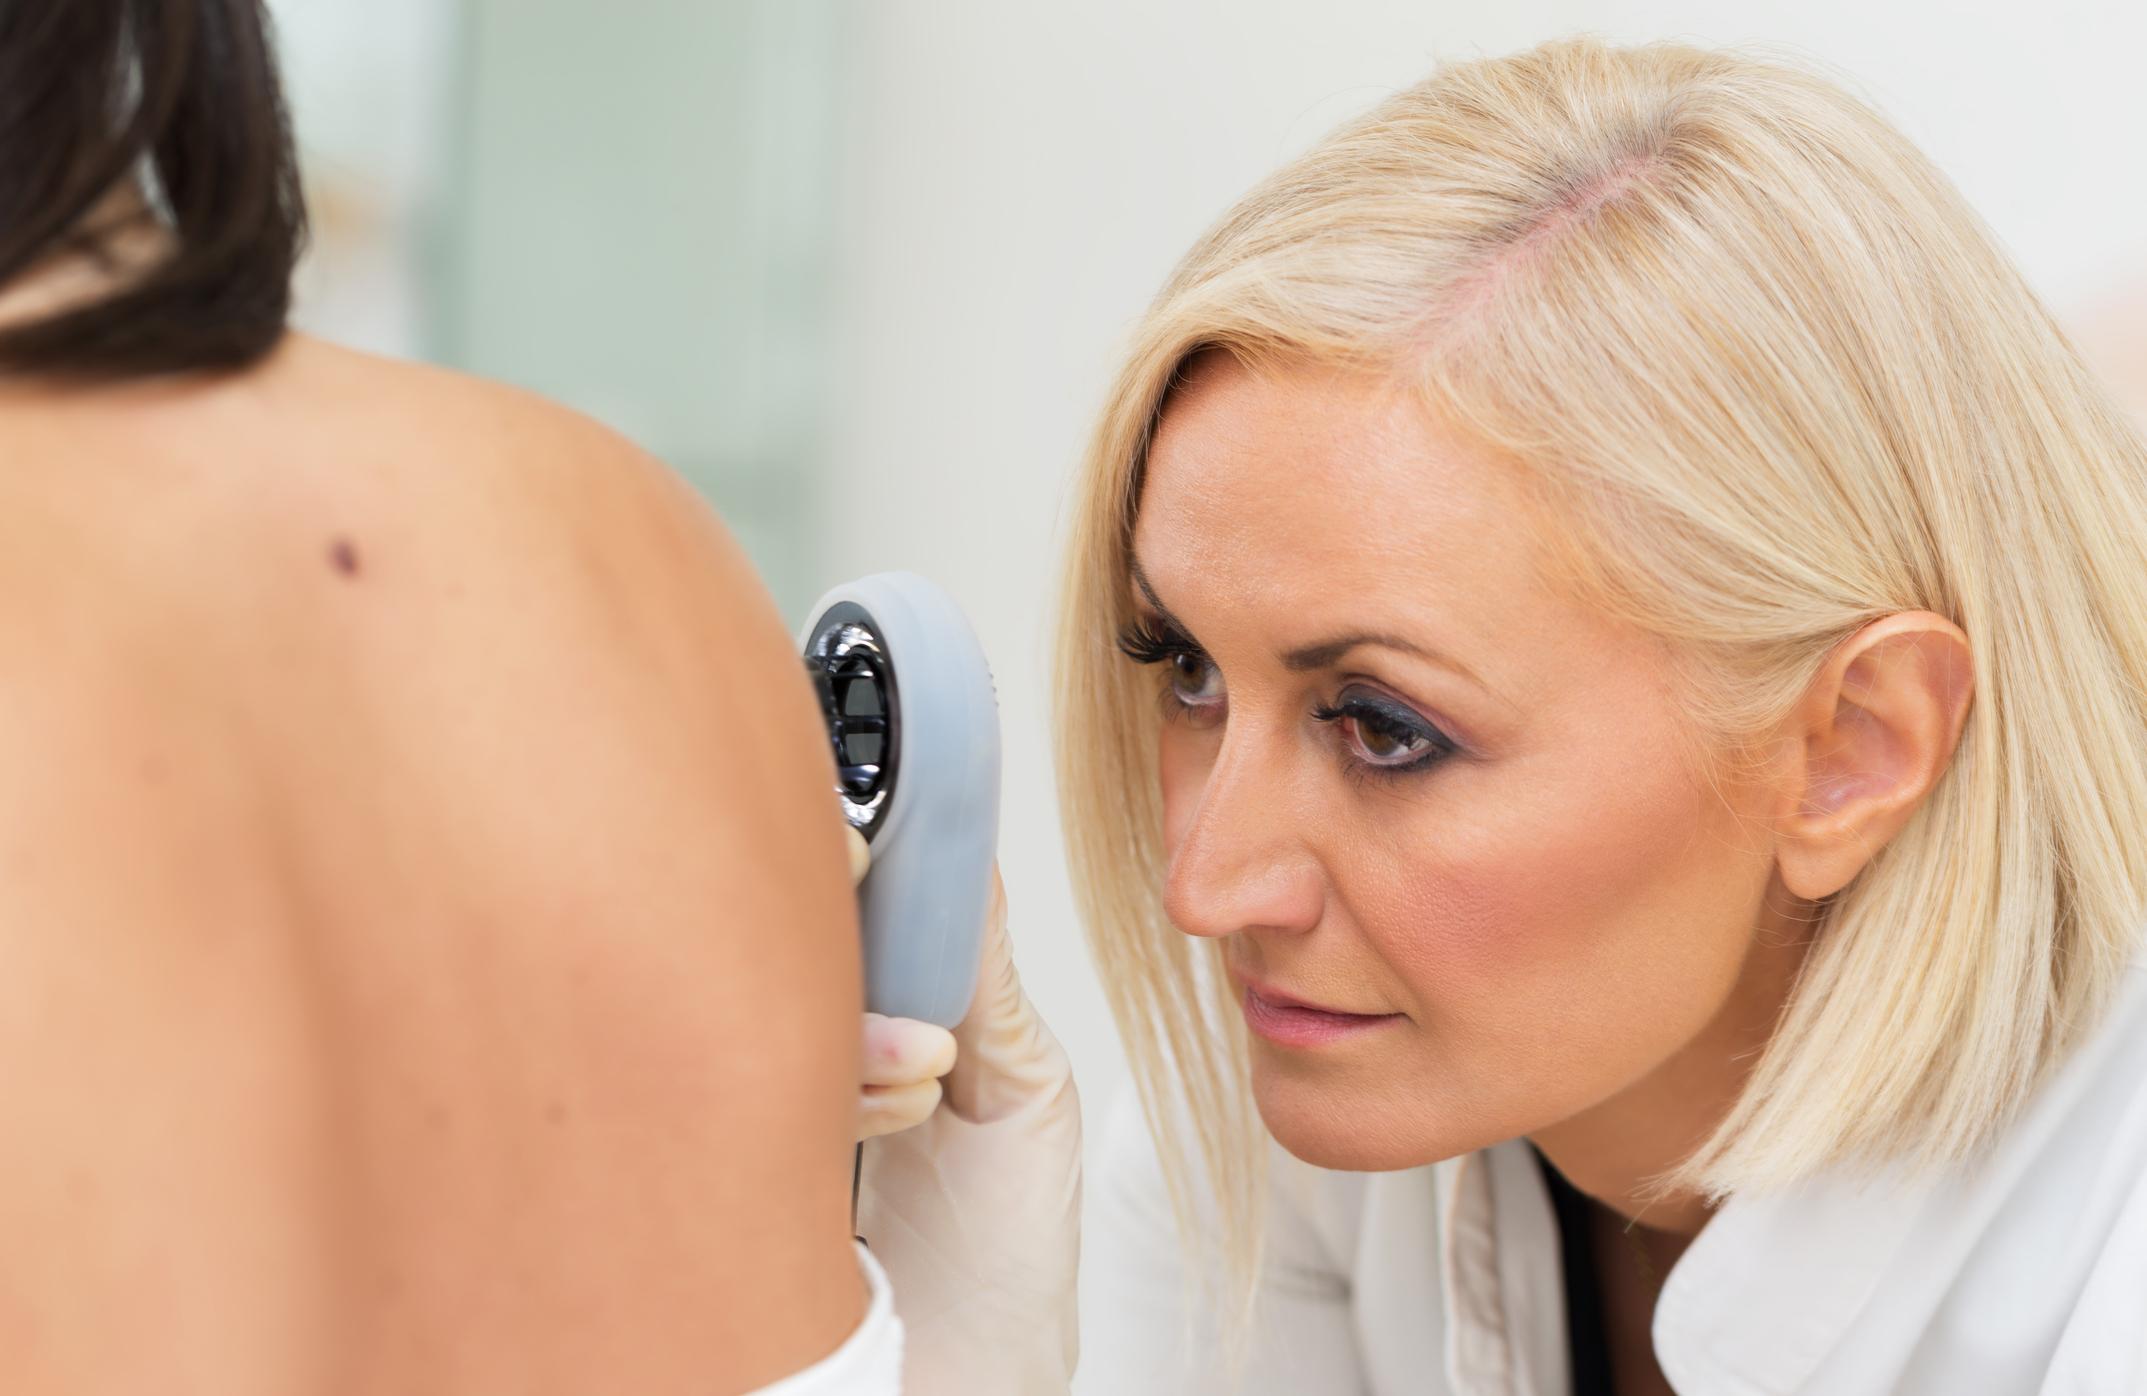 Skin Tags An External Indicator Of Your Internal Health Healthywomen